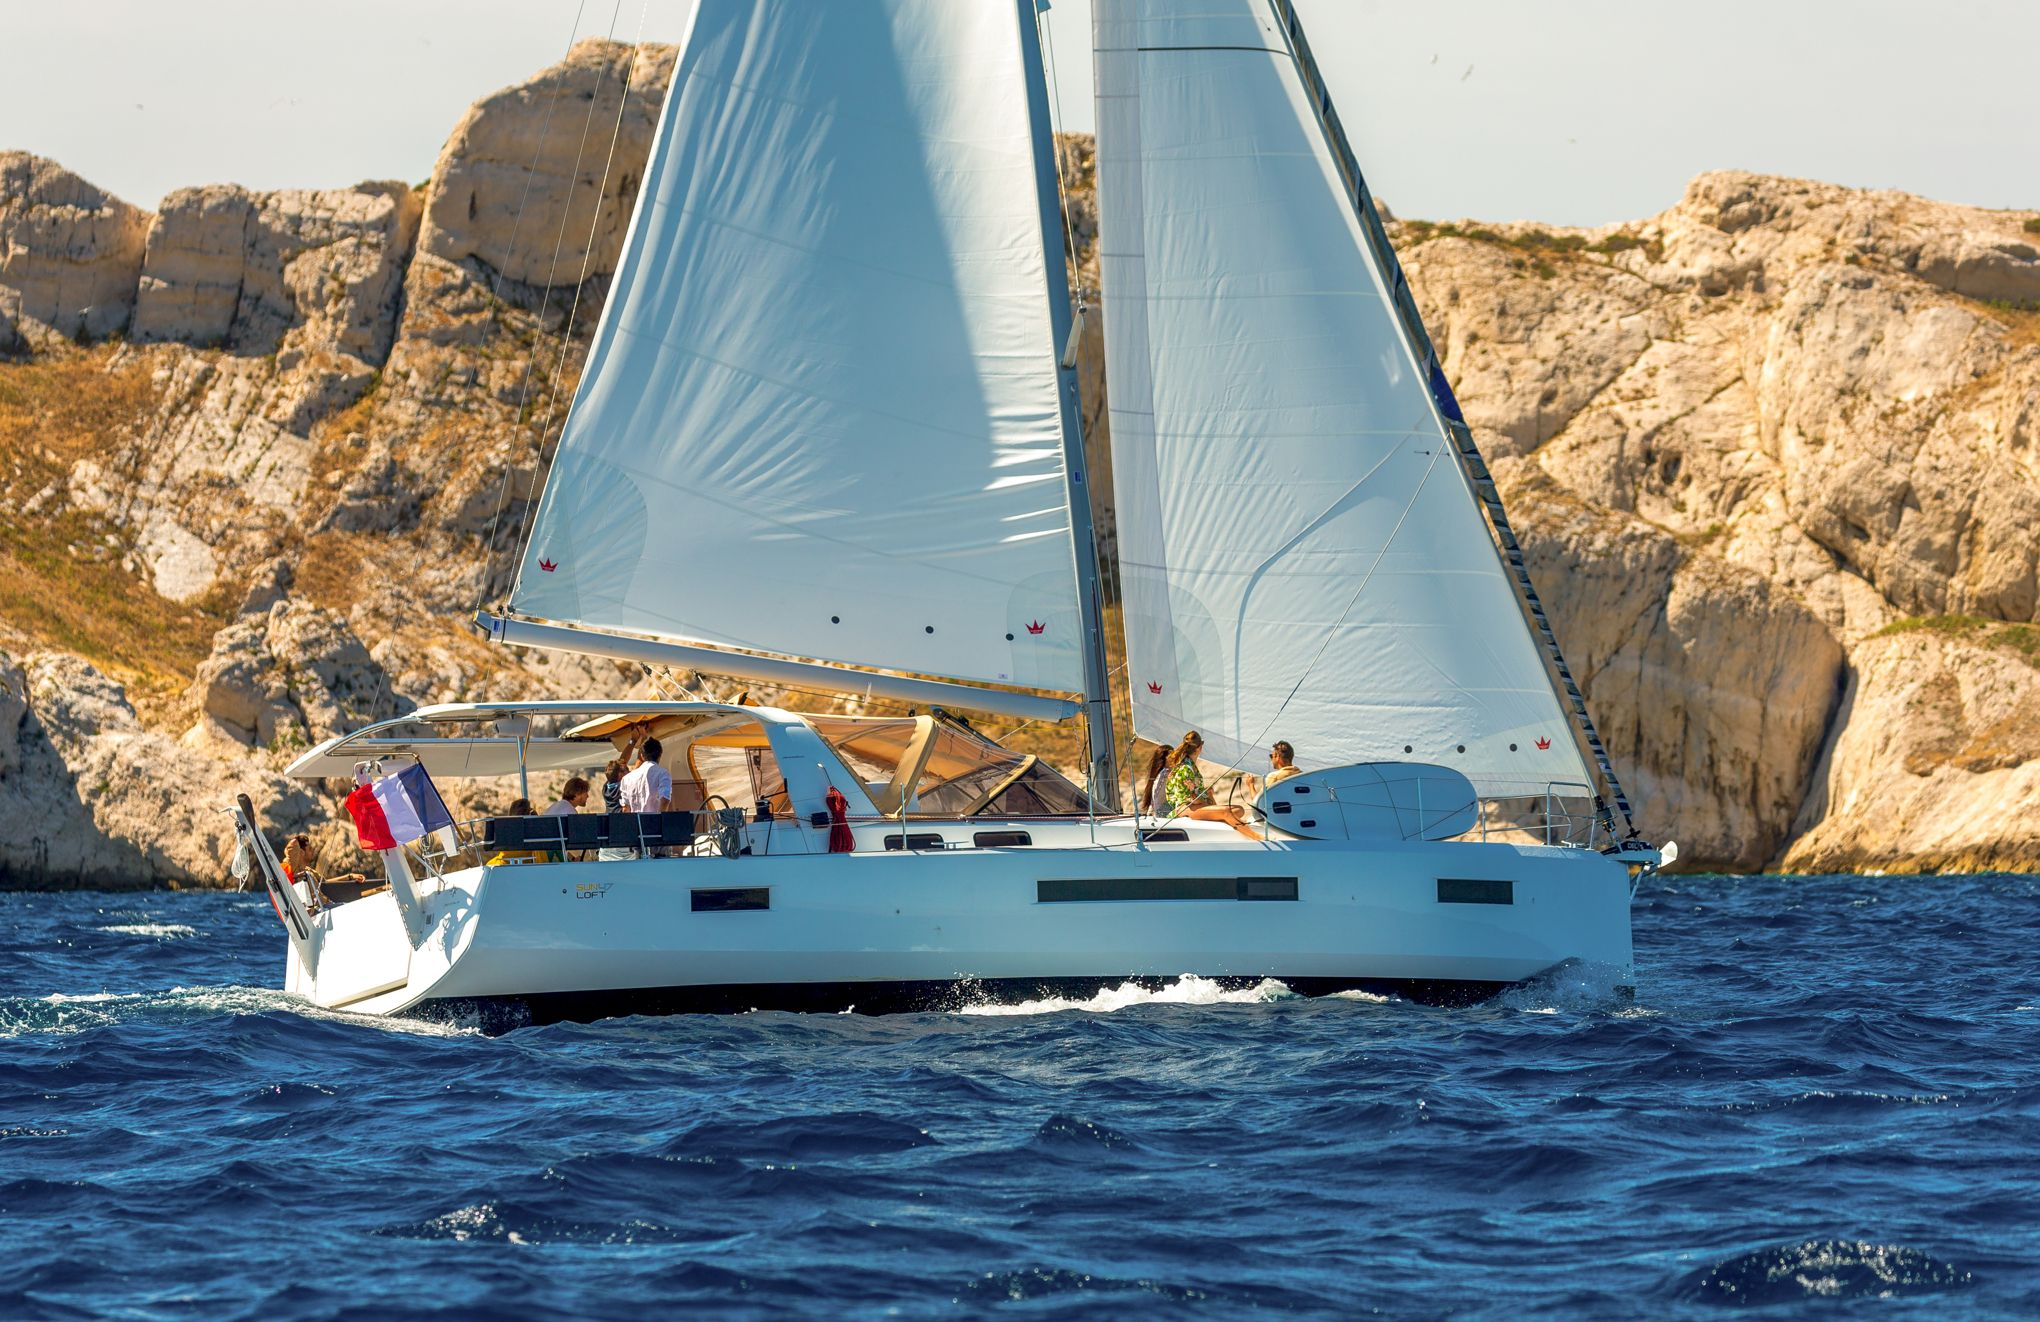 Nautisme: le Sun loft 47, un monocoque innovant aux airs de catamaran